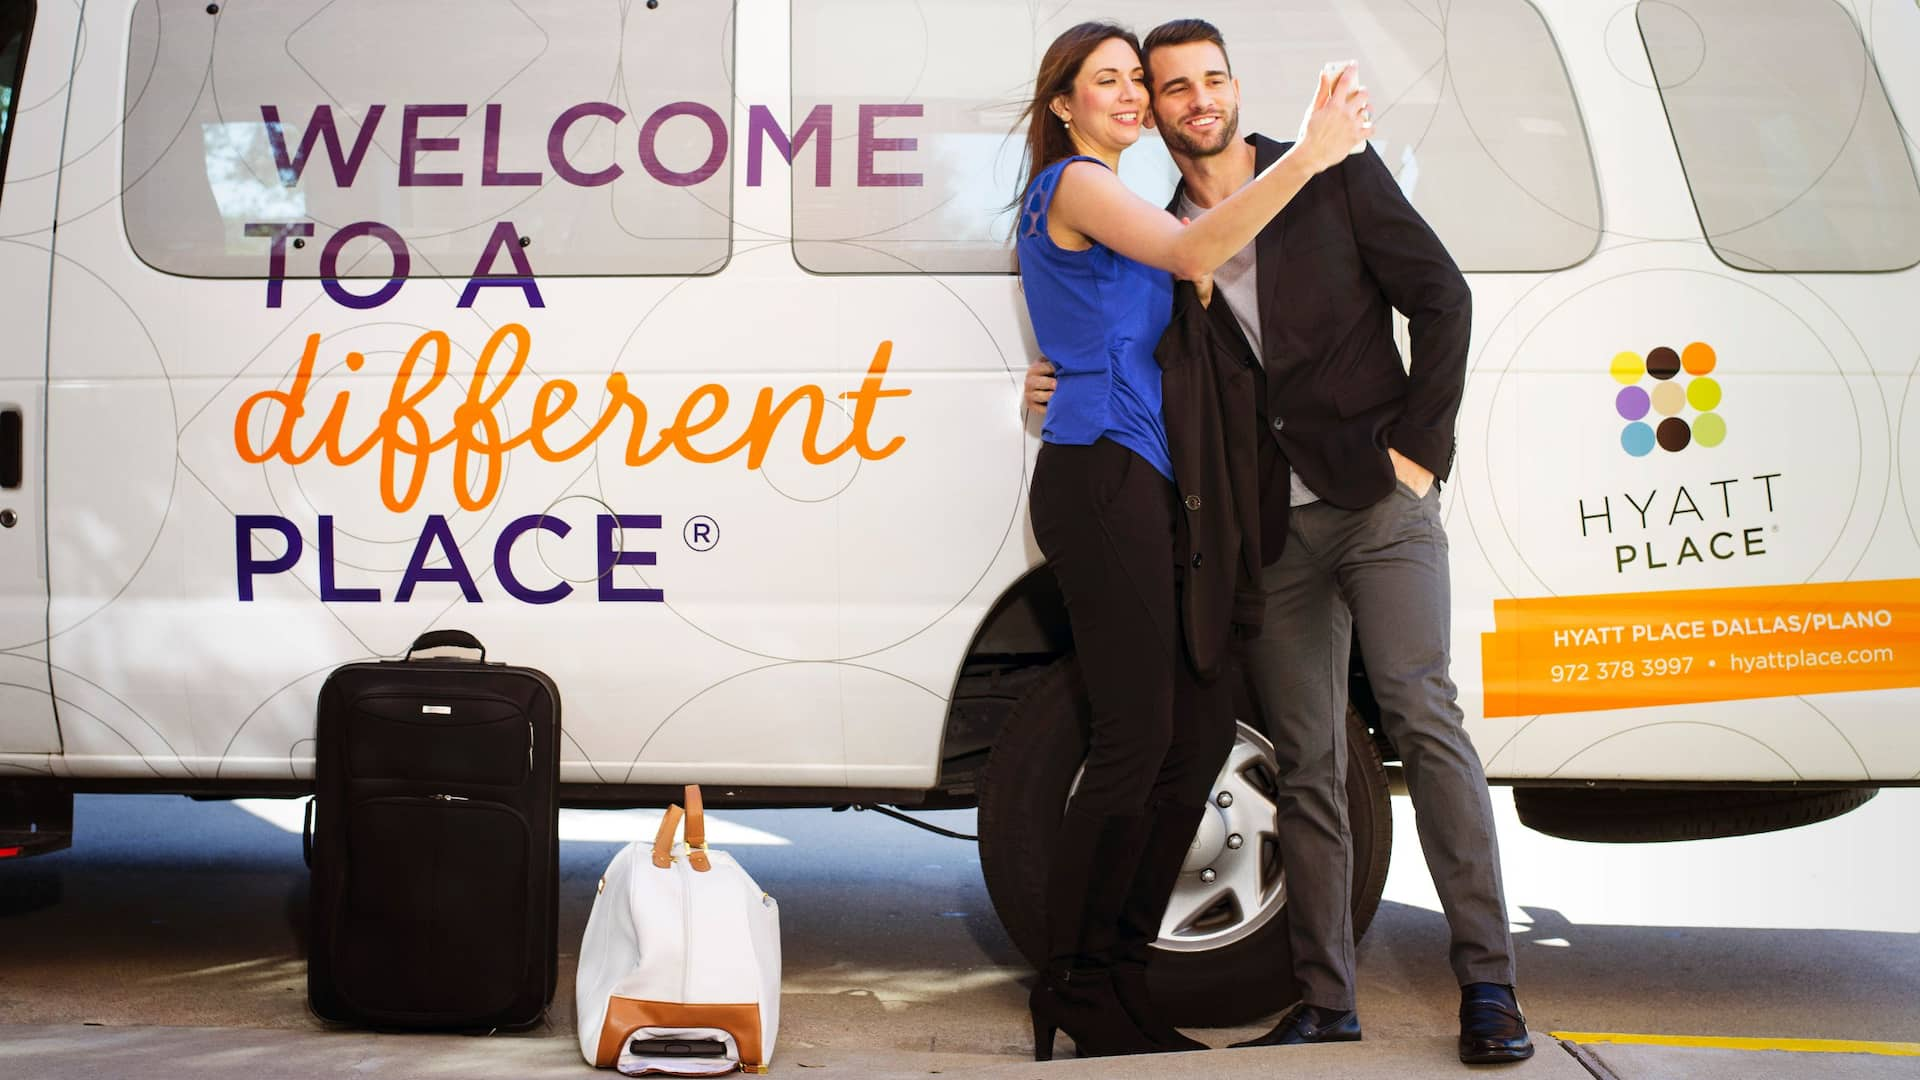 Shuttle Van Service